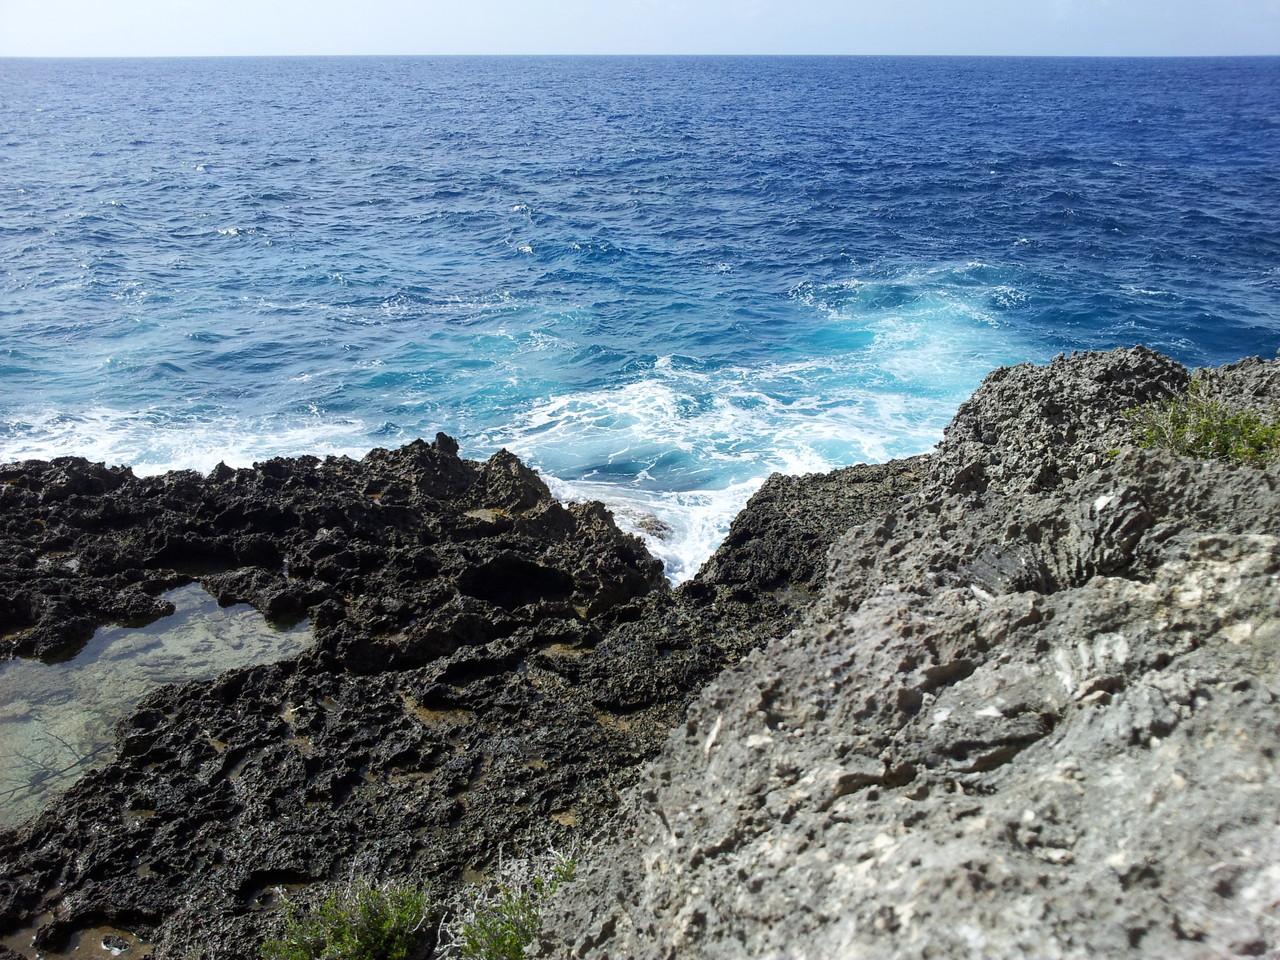 At the Cliffs